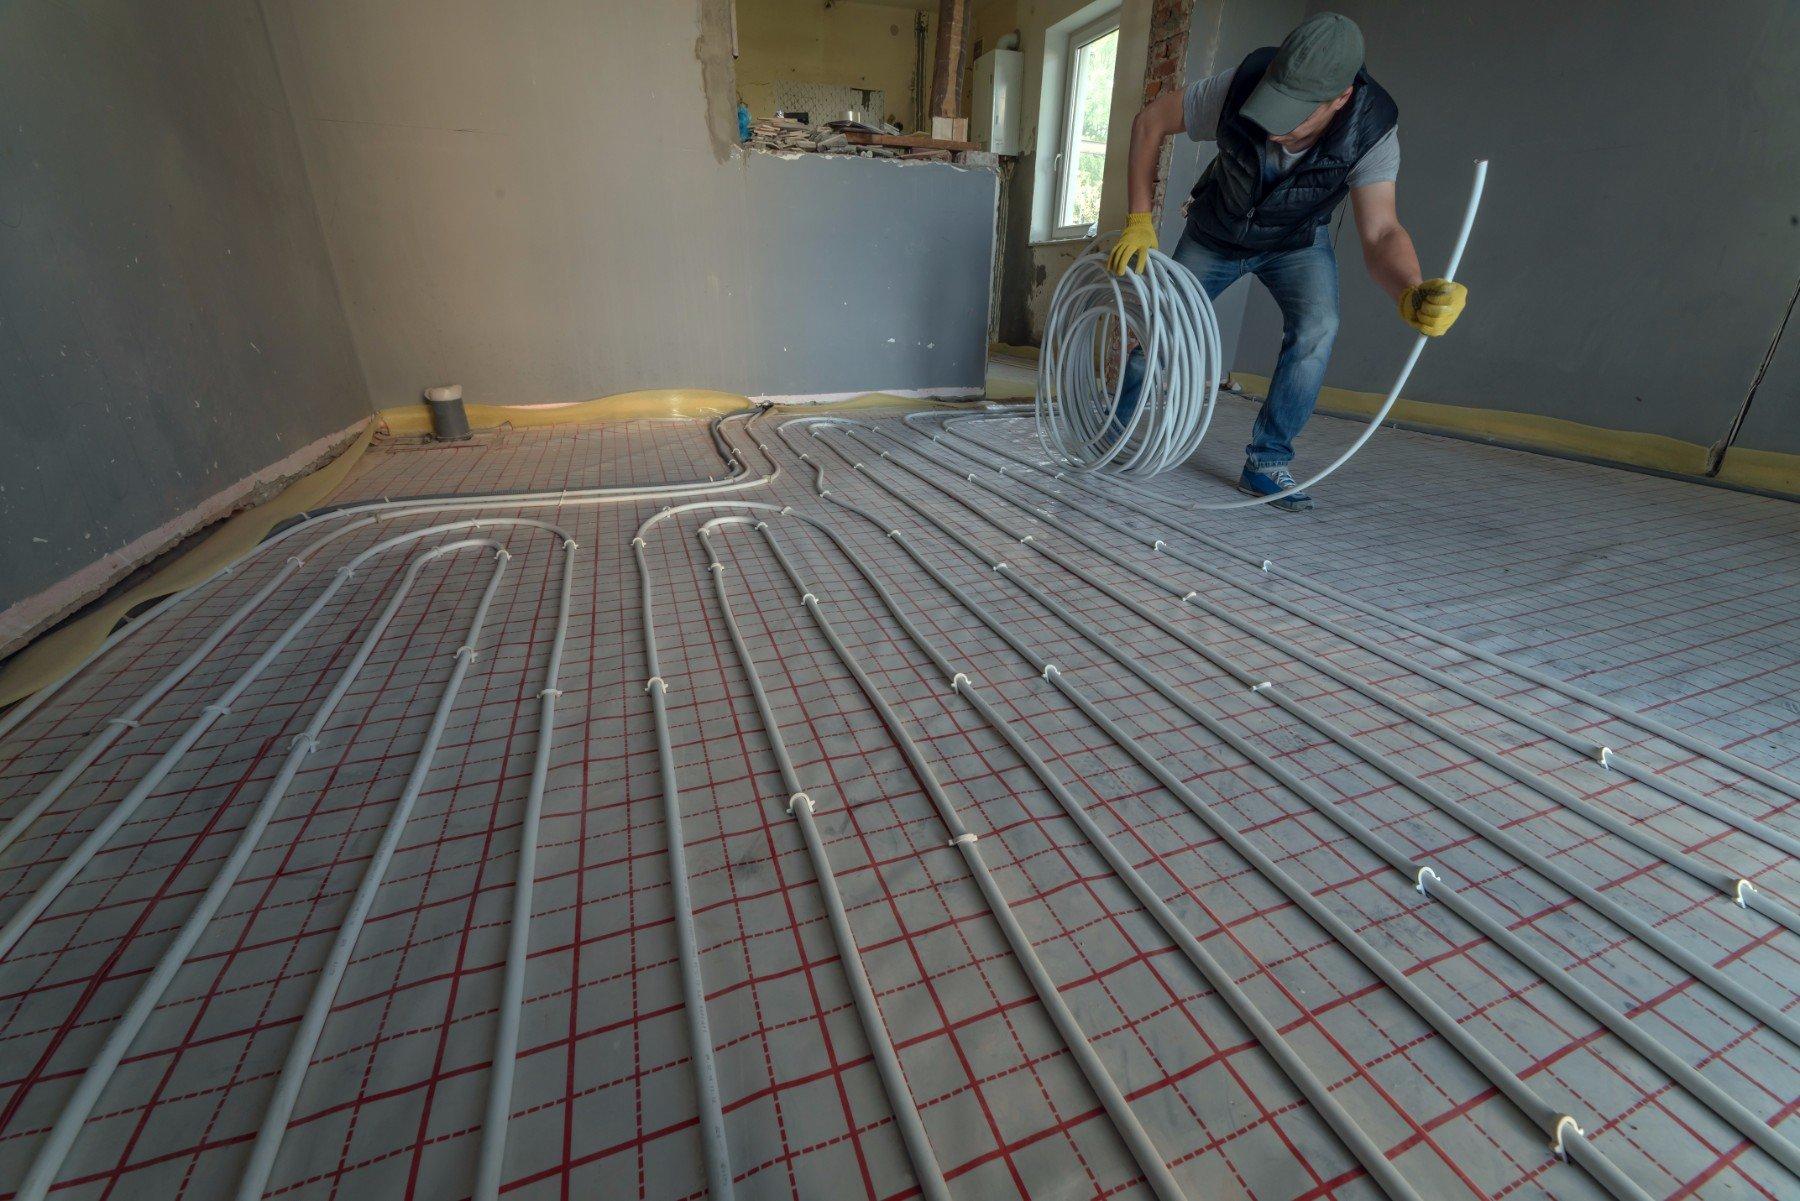 Installando impianto di riscaldamento a pavimento